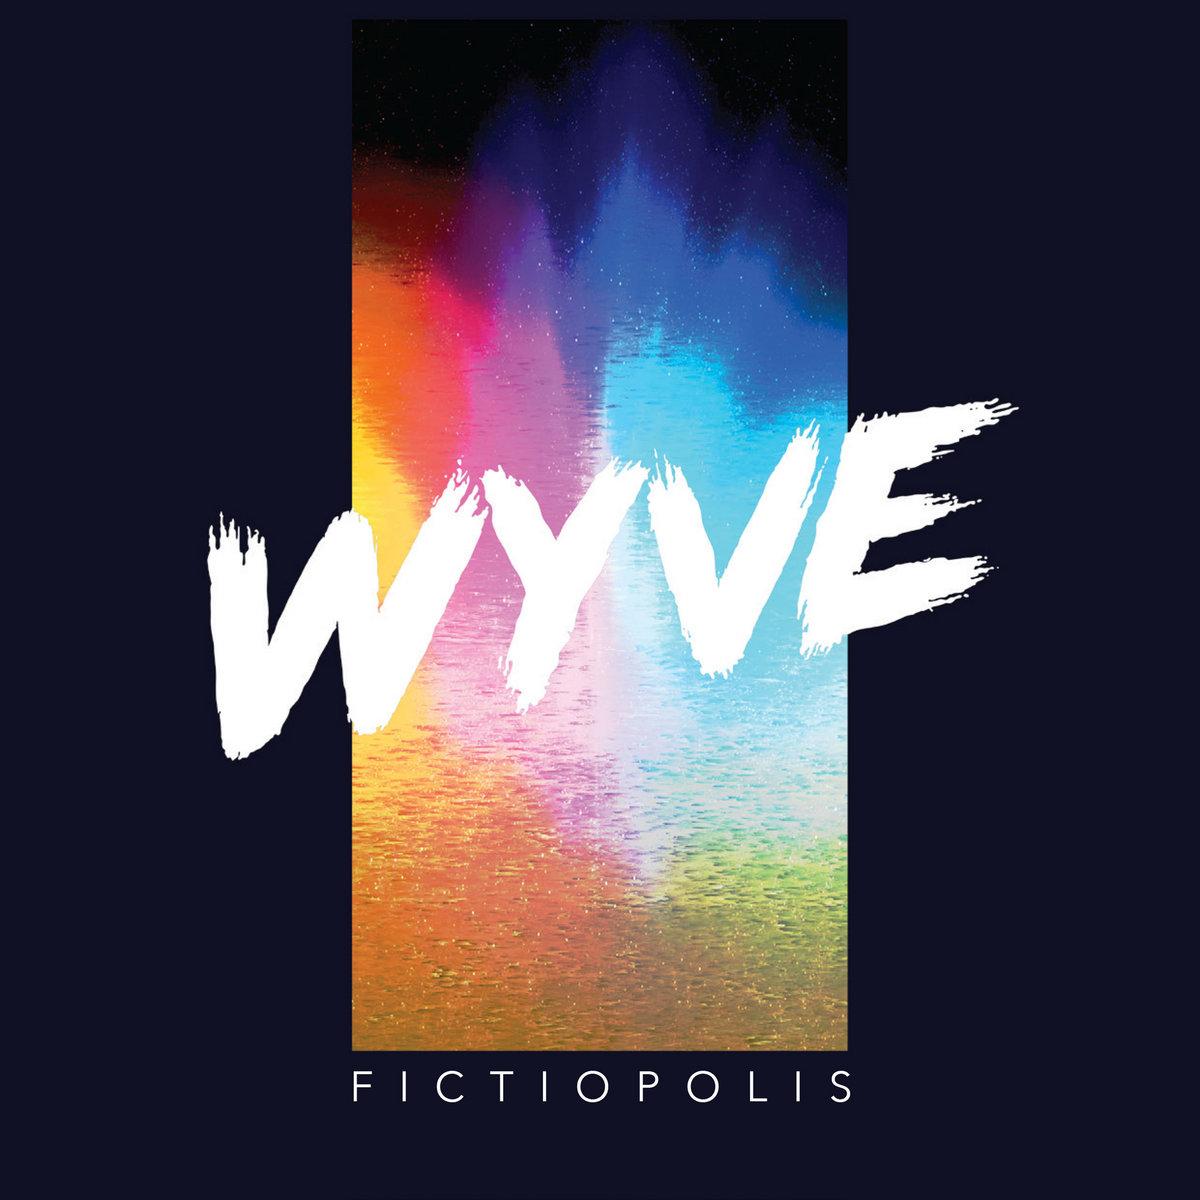 WYVE - Fictiopolis par Pauline Goyard (logo - Jean Carlier)